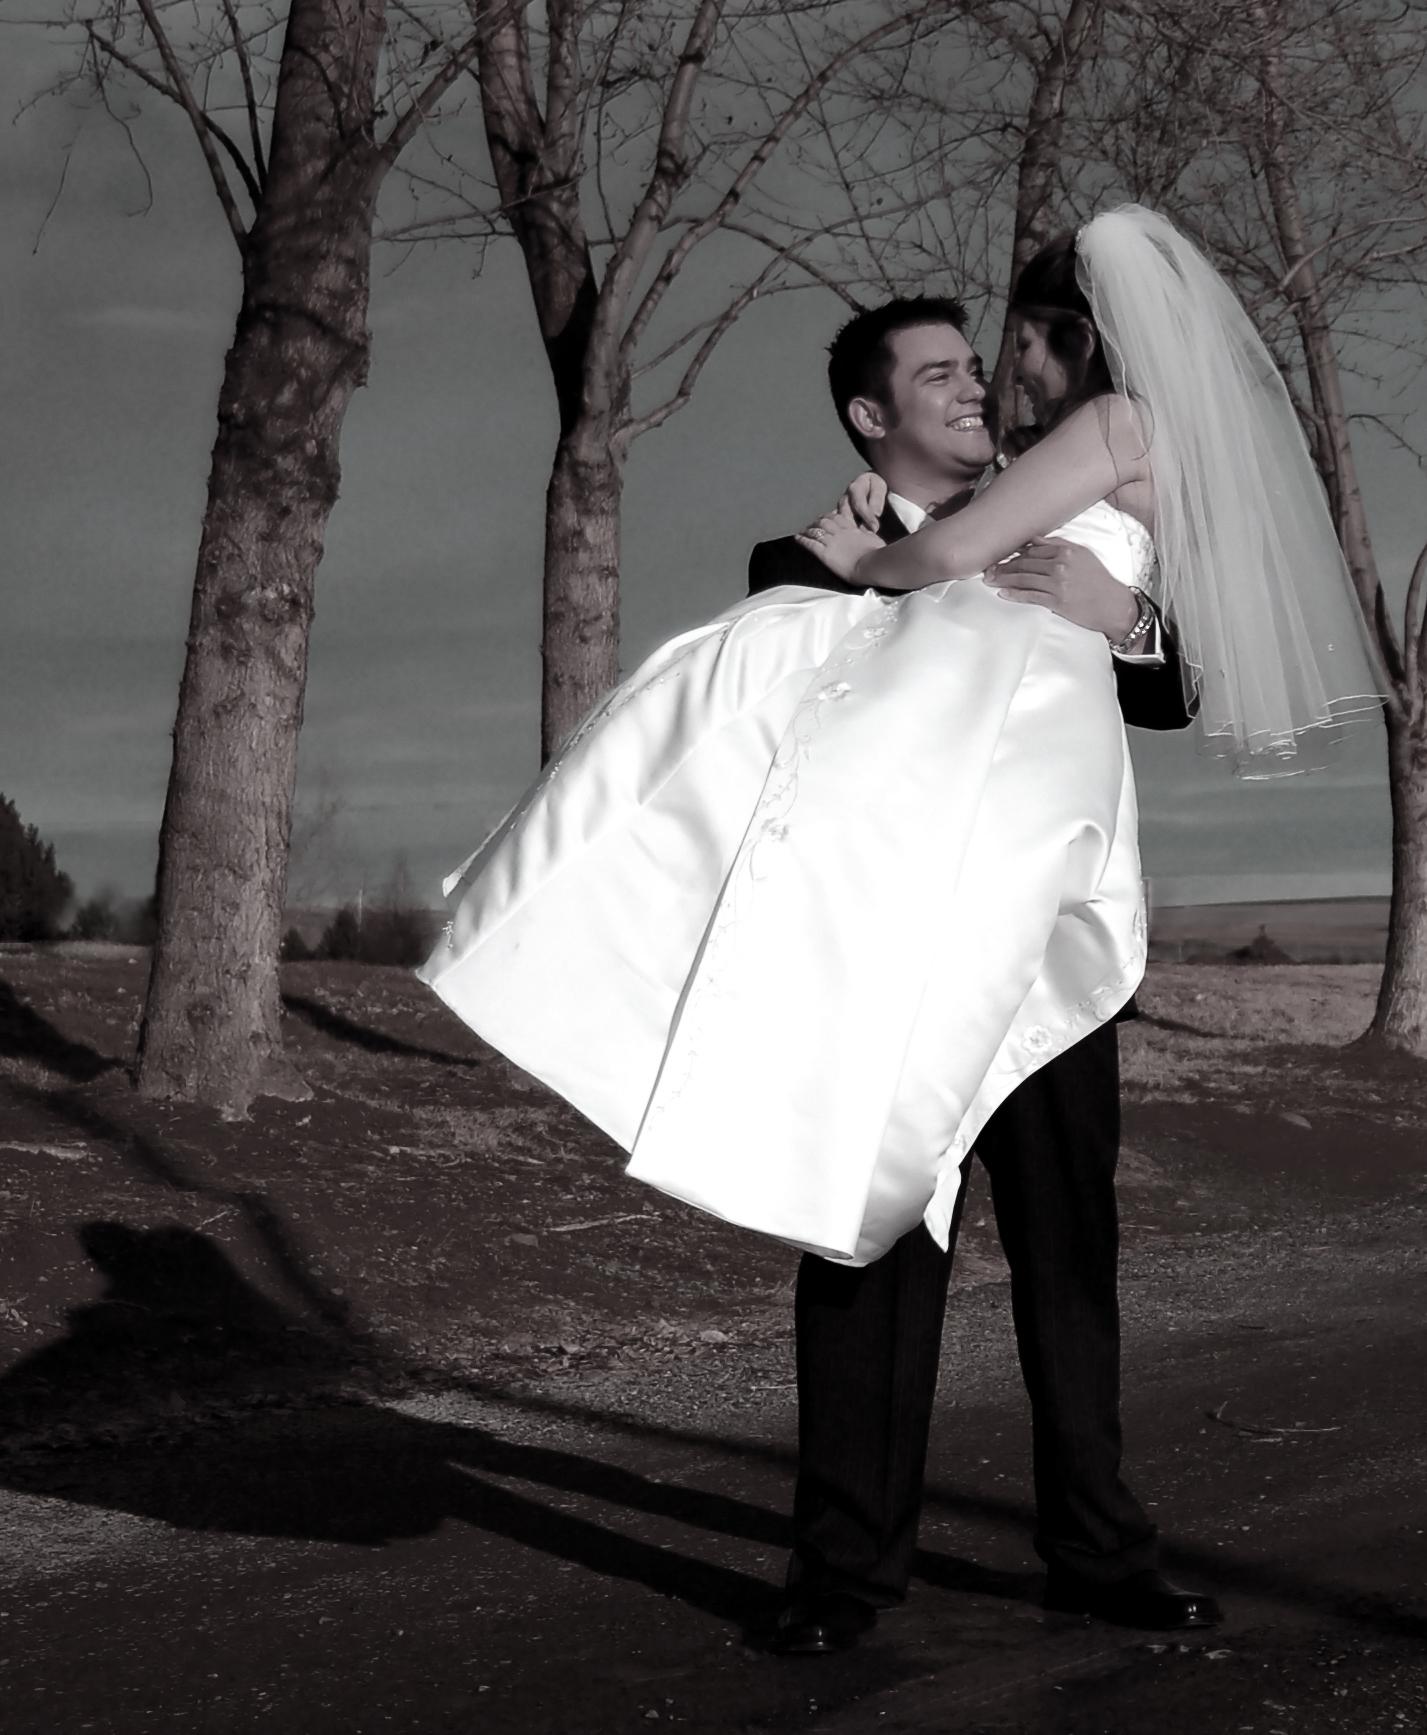 groom-carrying-bride-2-1312855